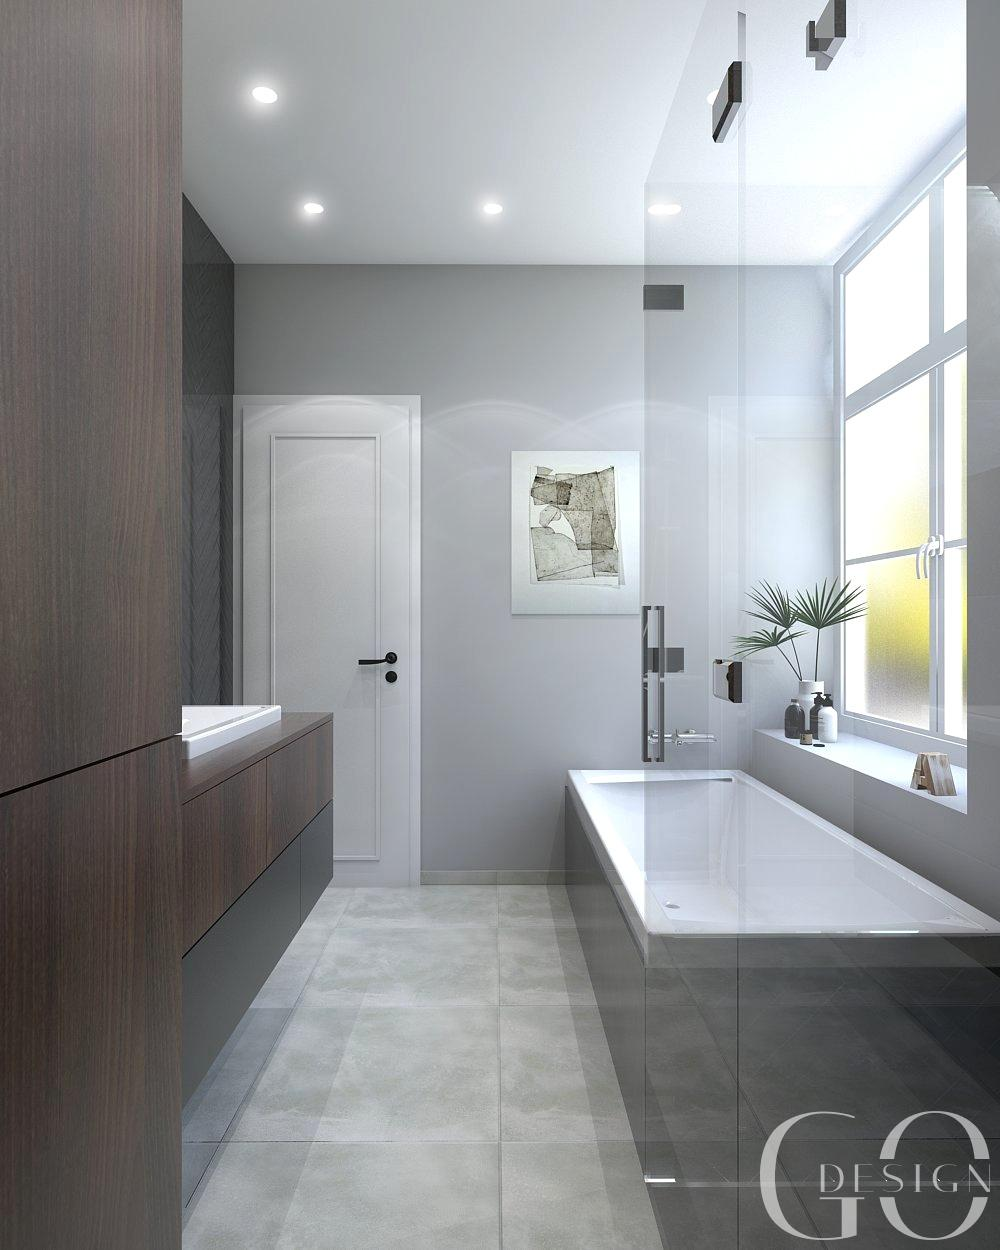 Návrh staromestského bytu v loftovom štýle - Rožňava - Obrázok č. 10